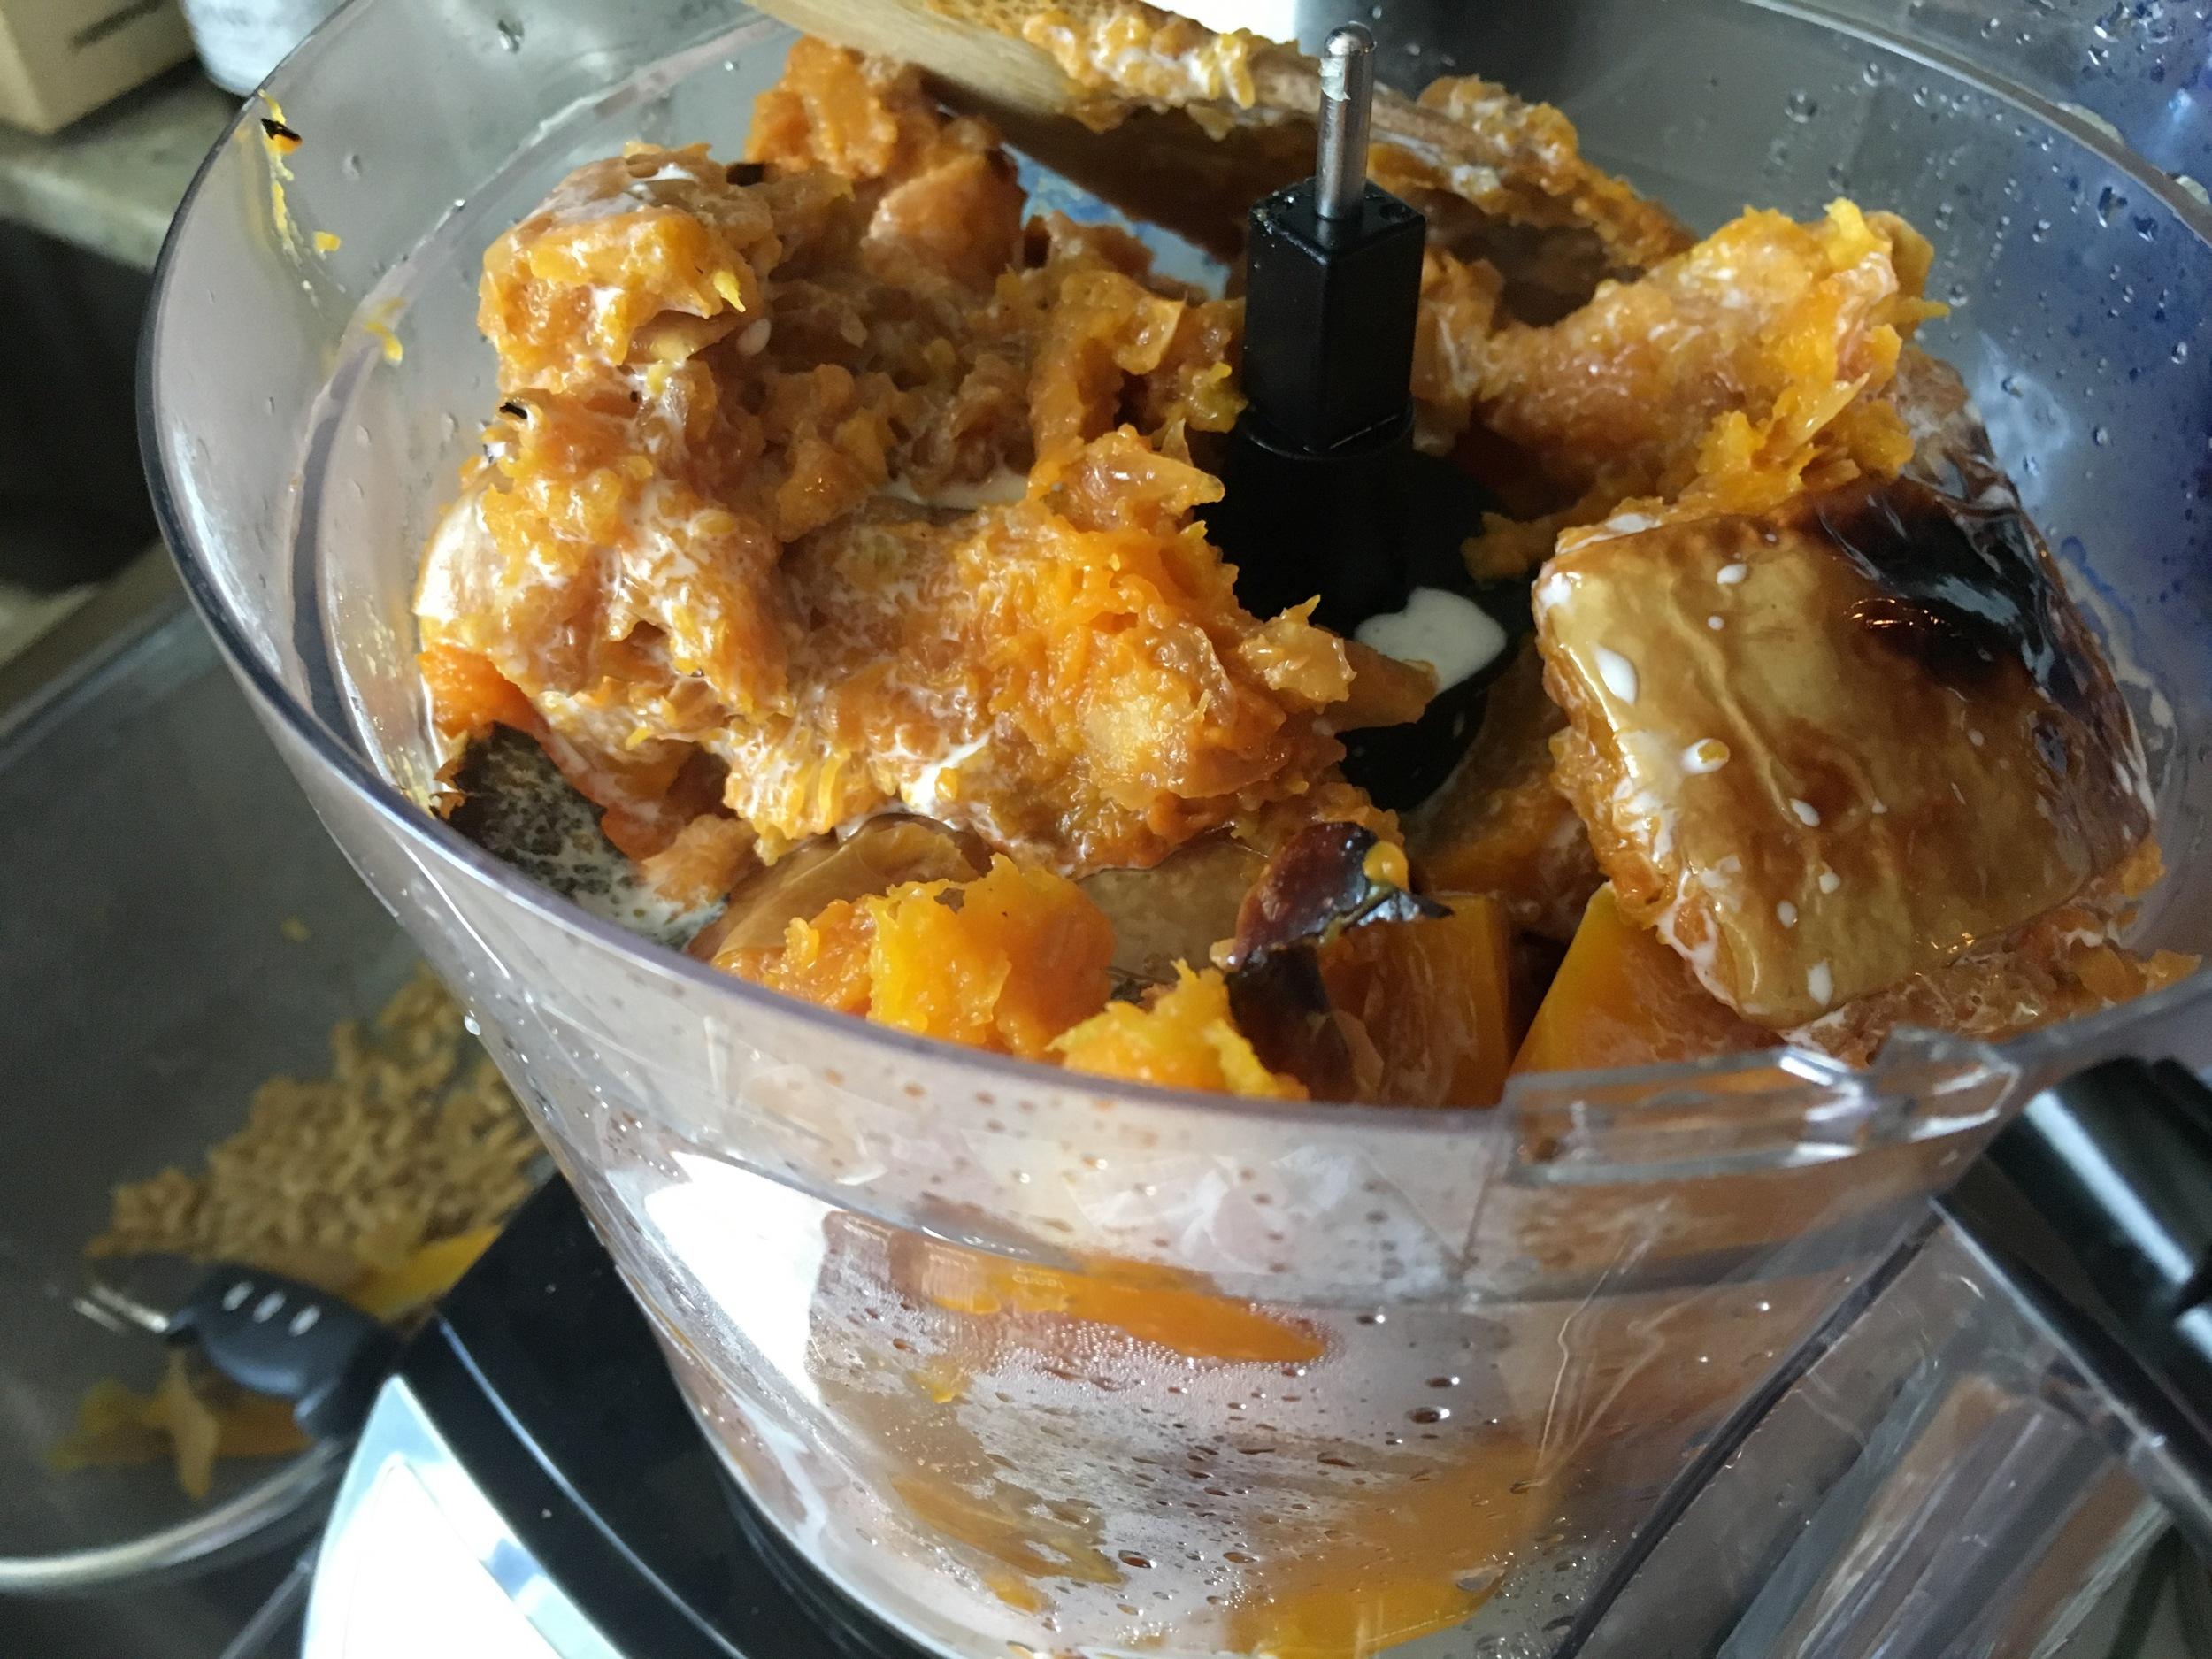 blending-pumpkin-food-processor